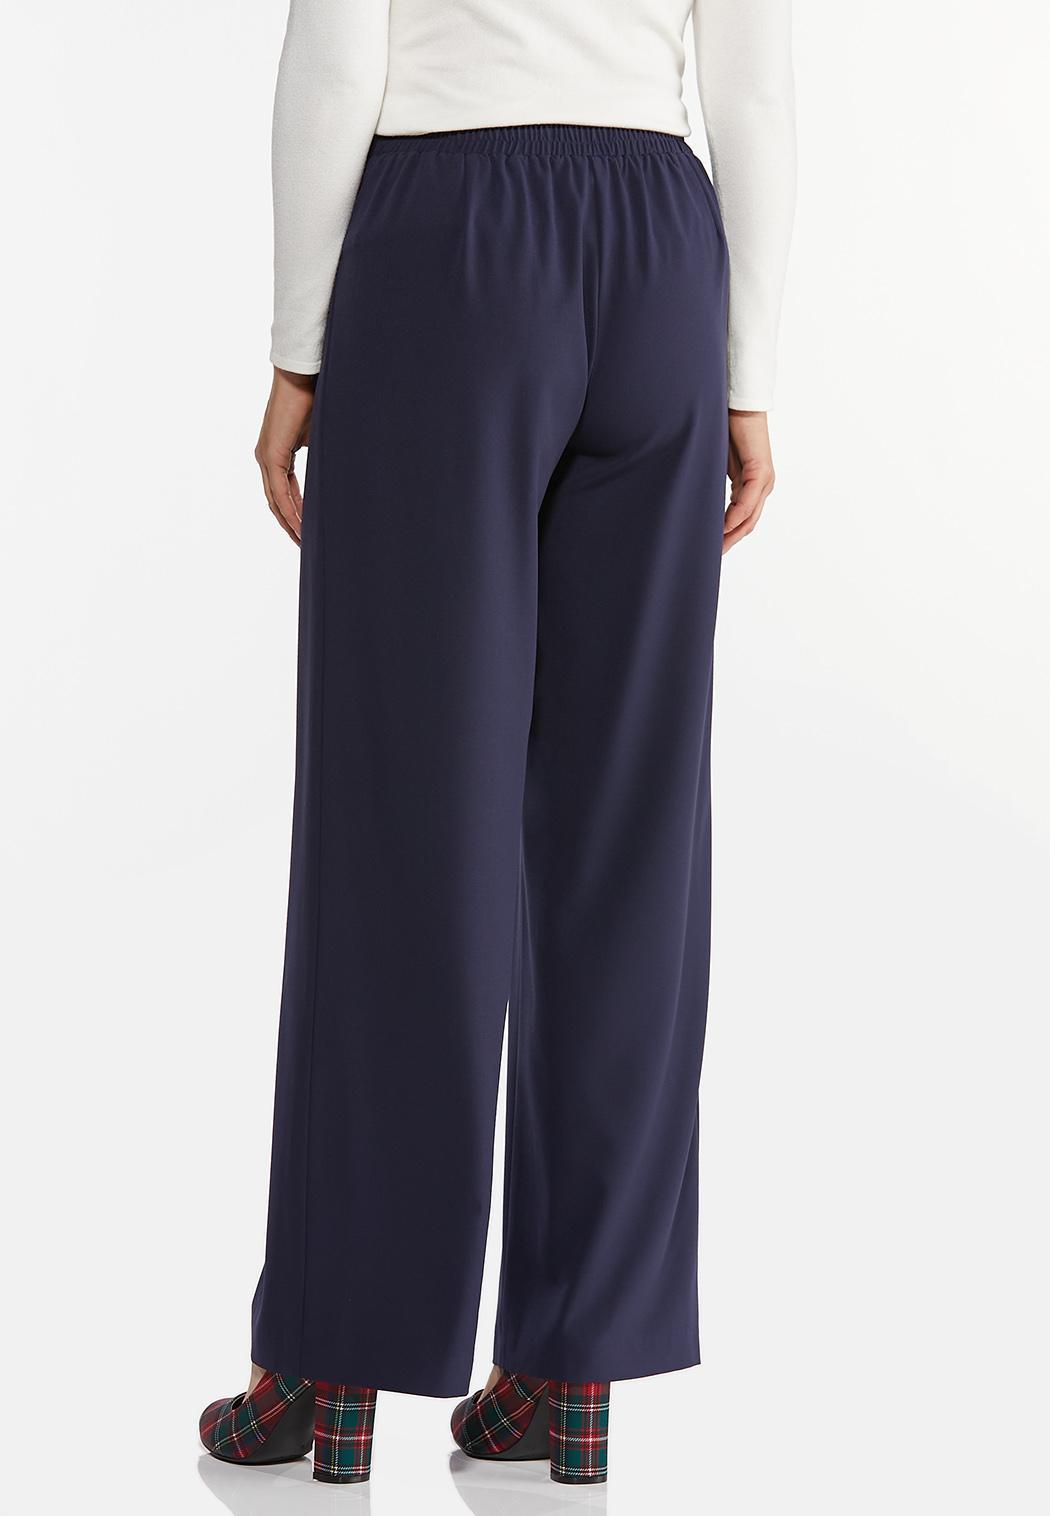 Belted Wide Leg Pants (Item #44411572)